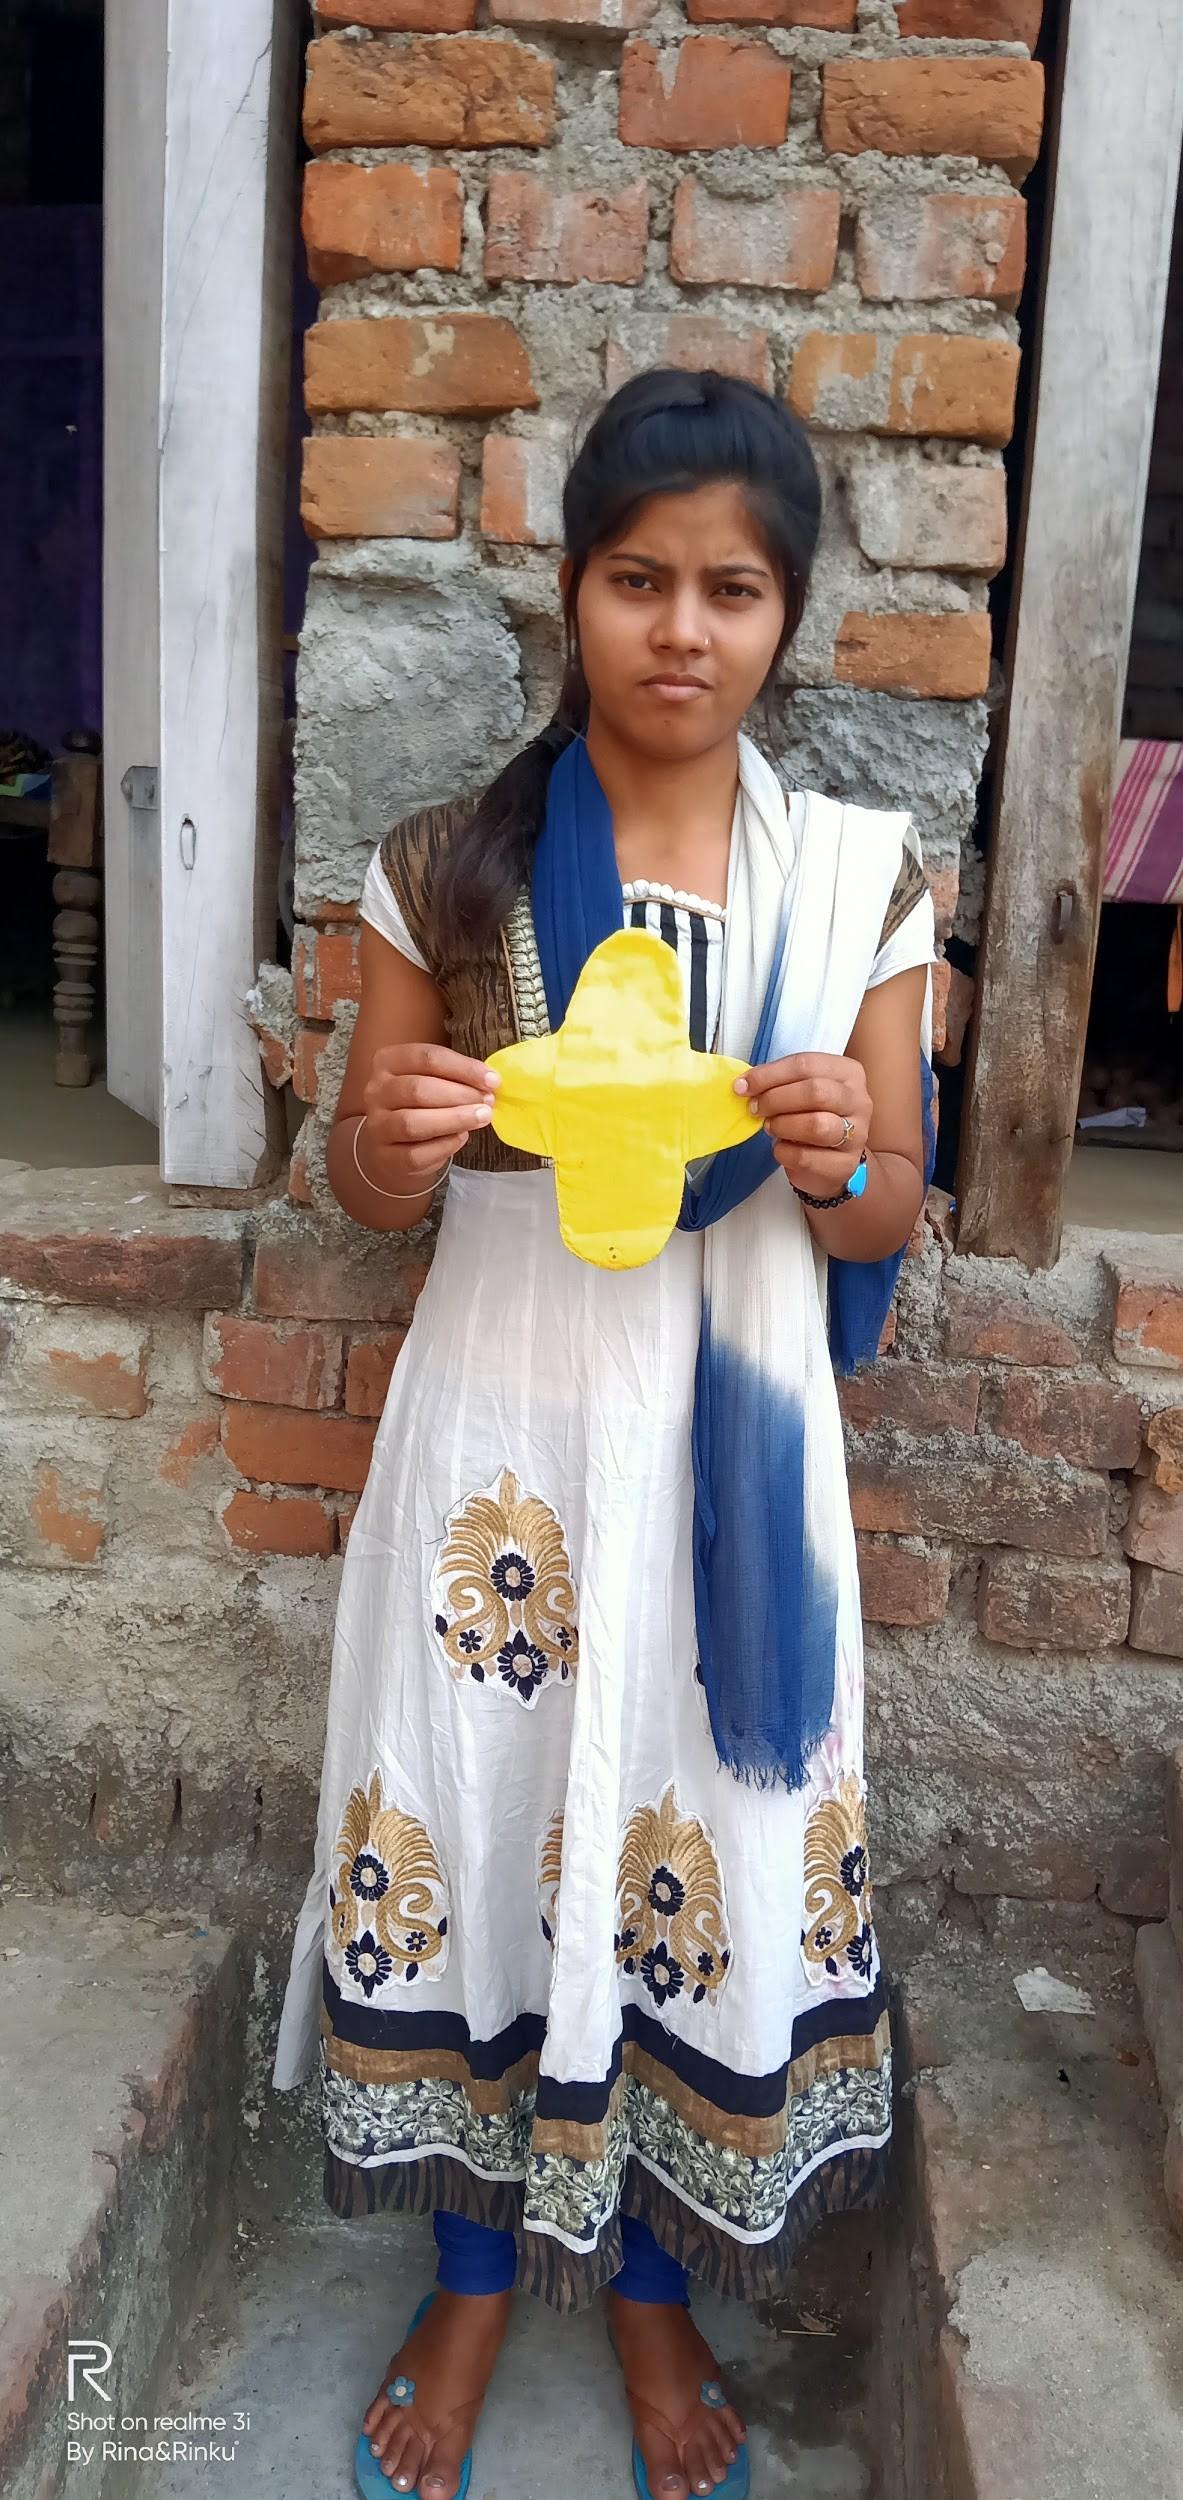 Nitu Kumari holding a hand-sewn pad